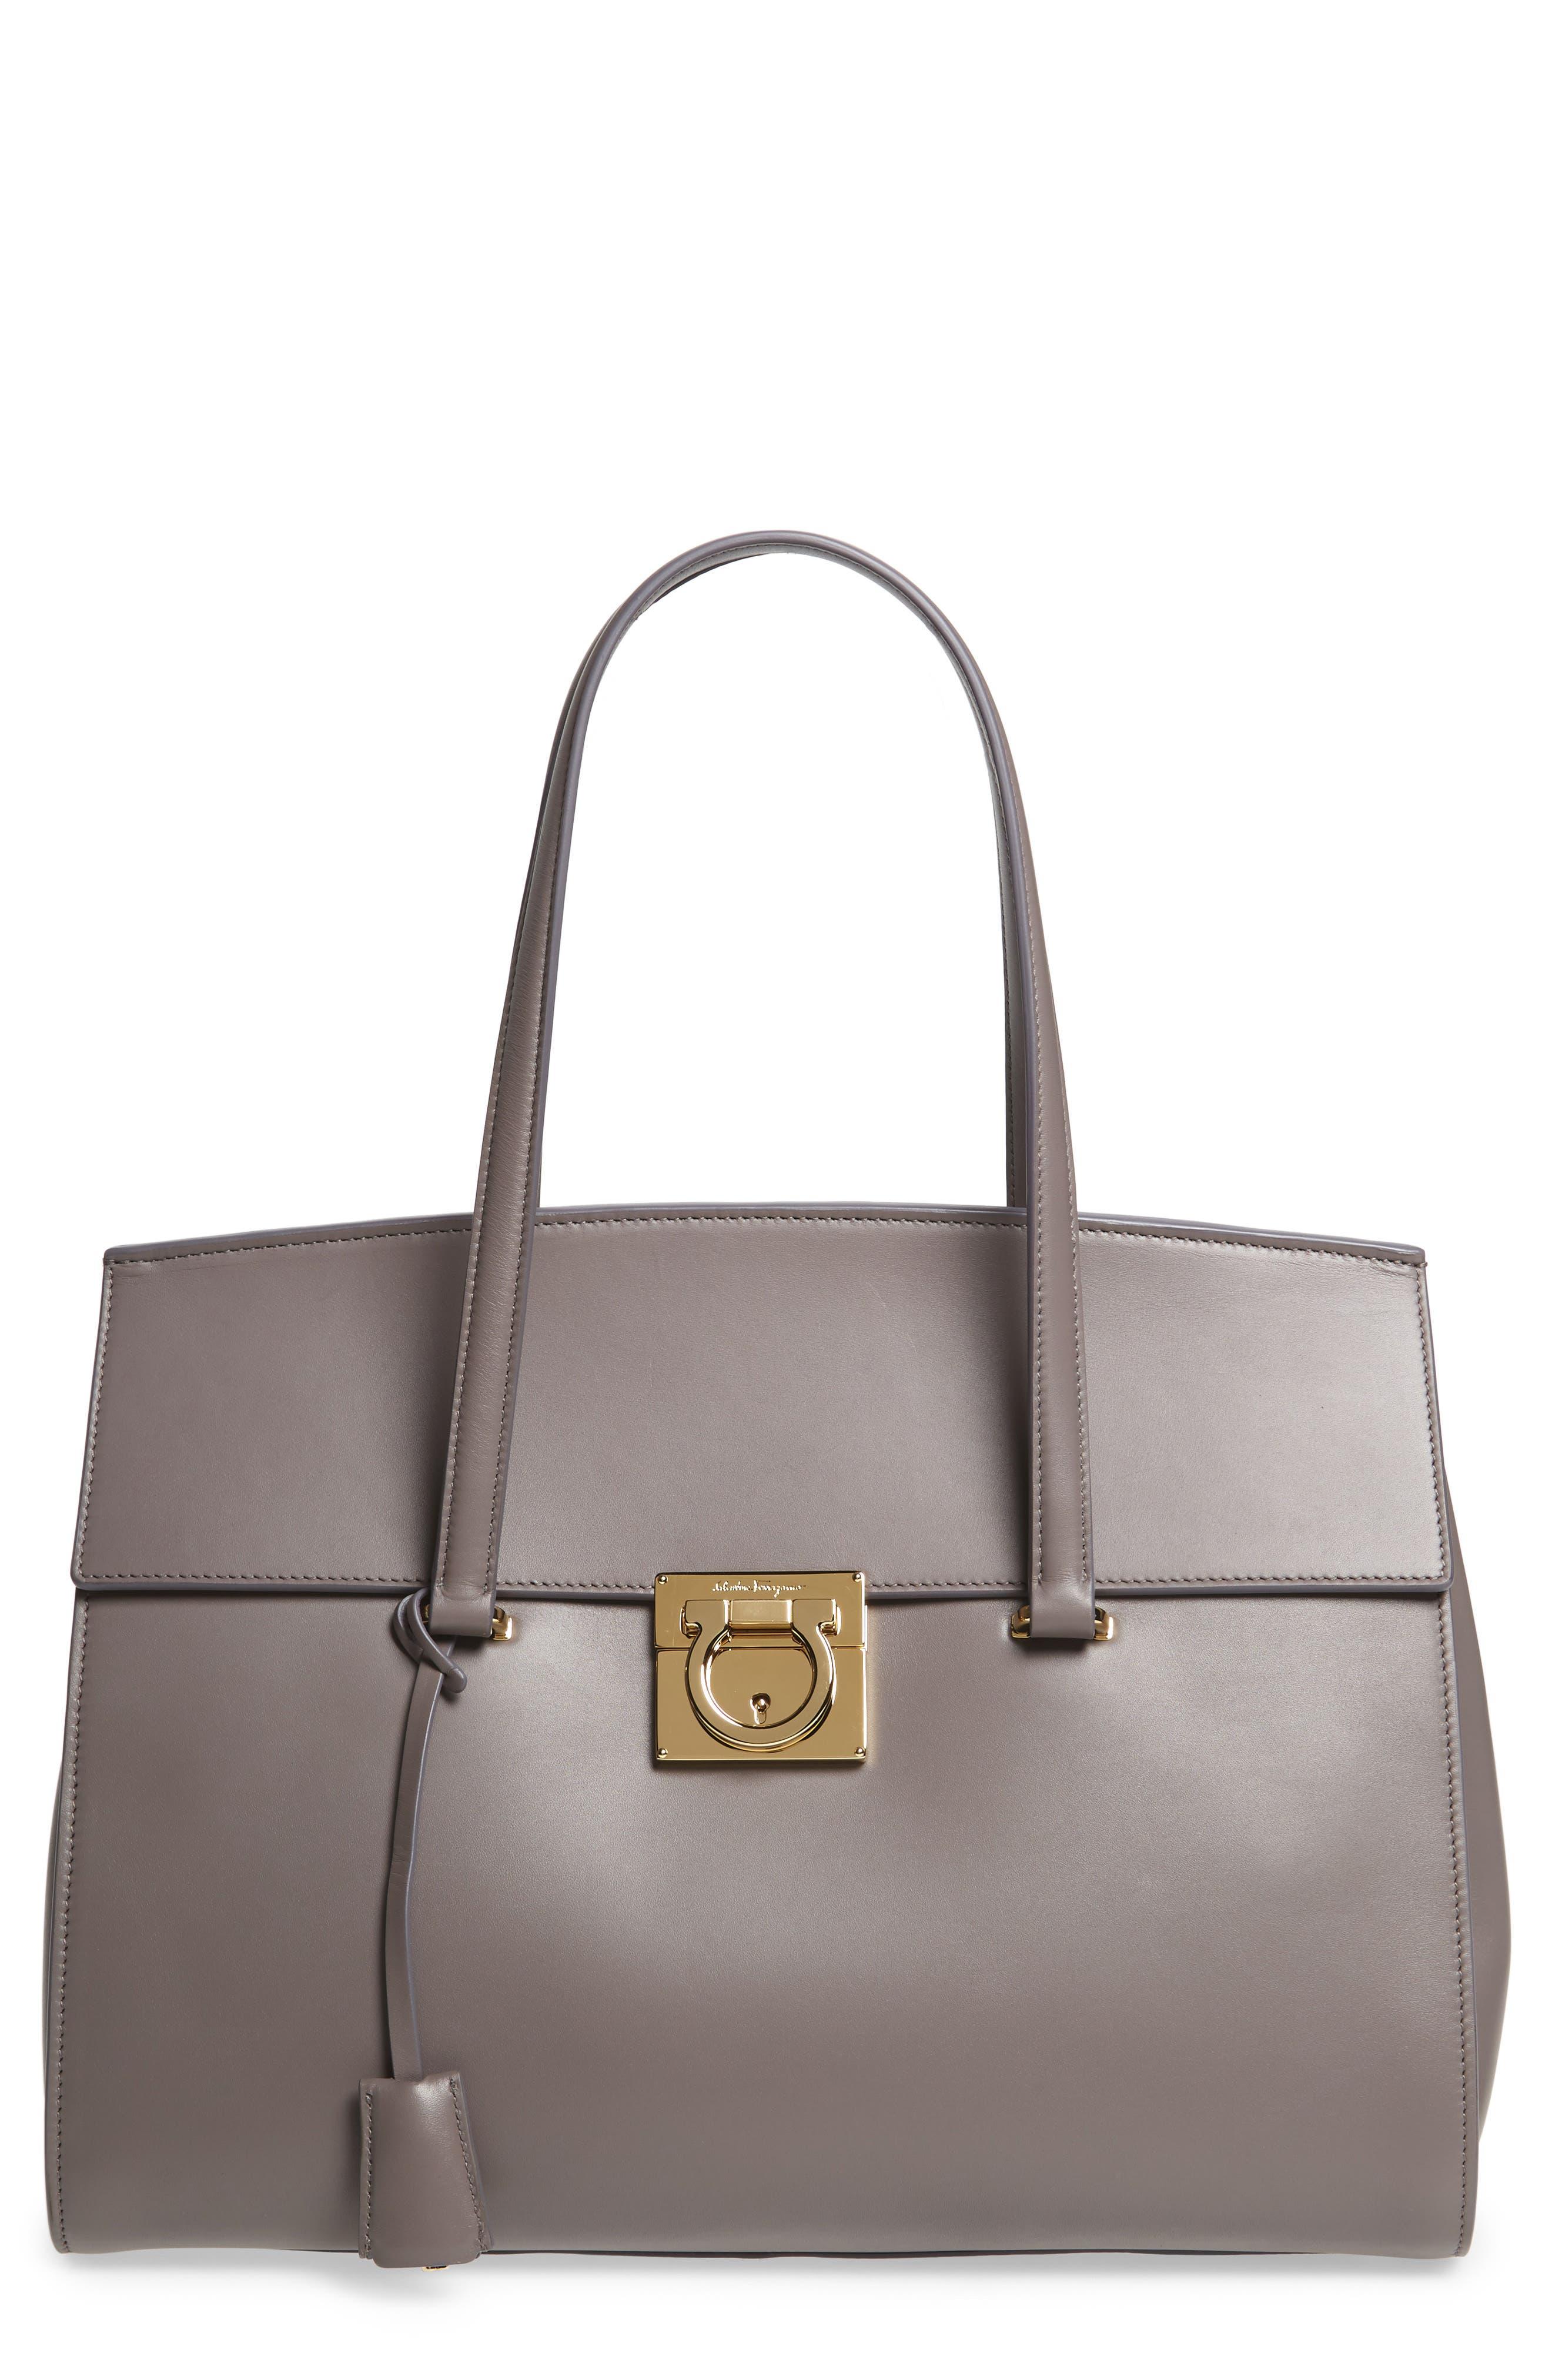 Salvatore Ferragamo Large Smooth Leather Tote